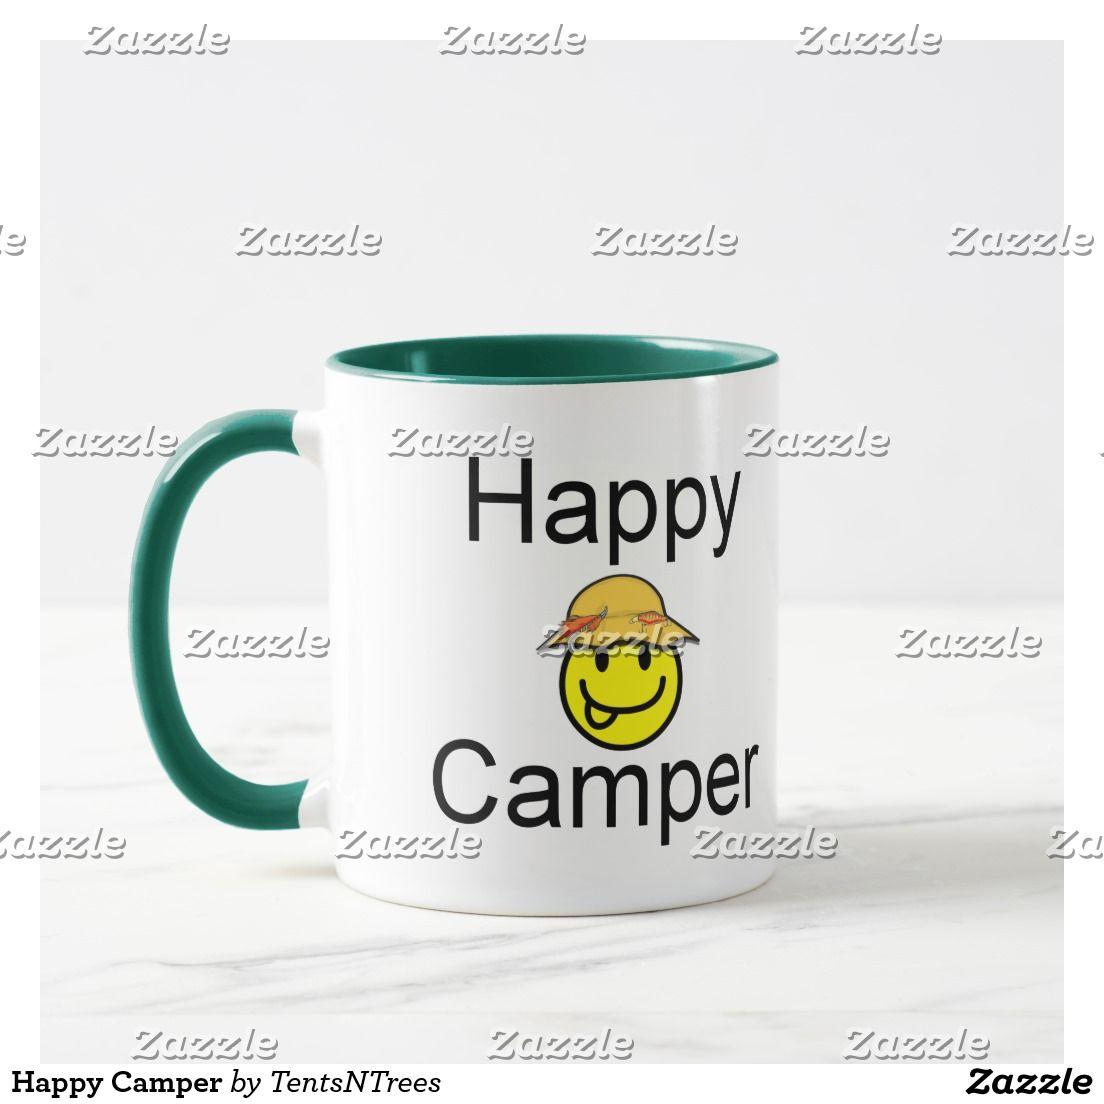 Happy Camper Coffee Mug on Zazzle @zazzle #zazzle #coffee #mug #travel #fish #fishing #camping #outdoors #nature #sport #funny #humor #drink #beverage #morning #joe #gift #idea #men #women